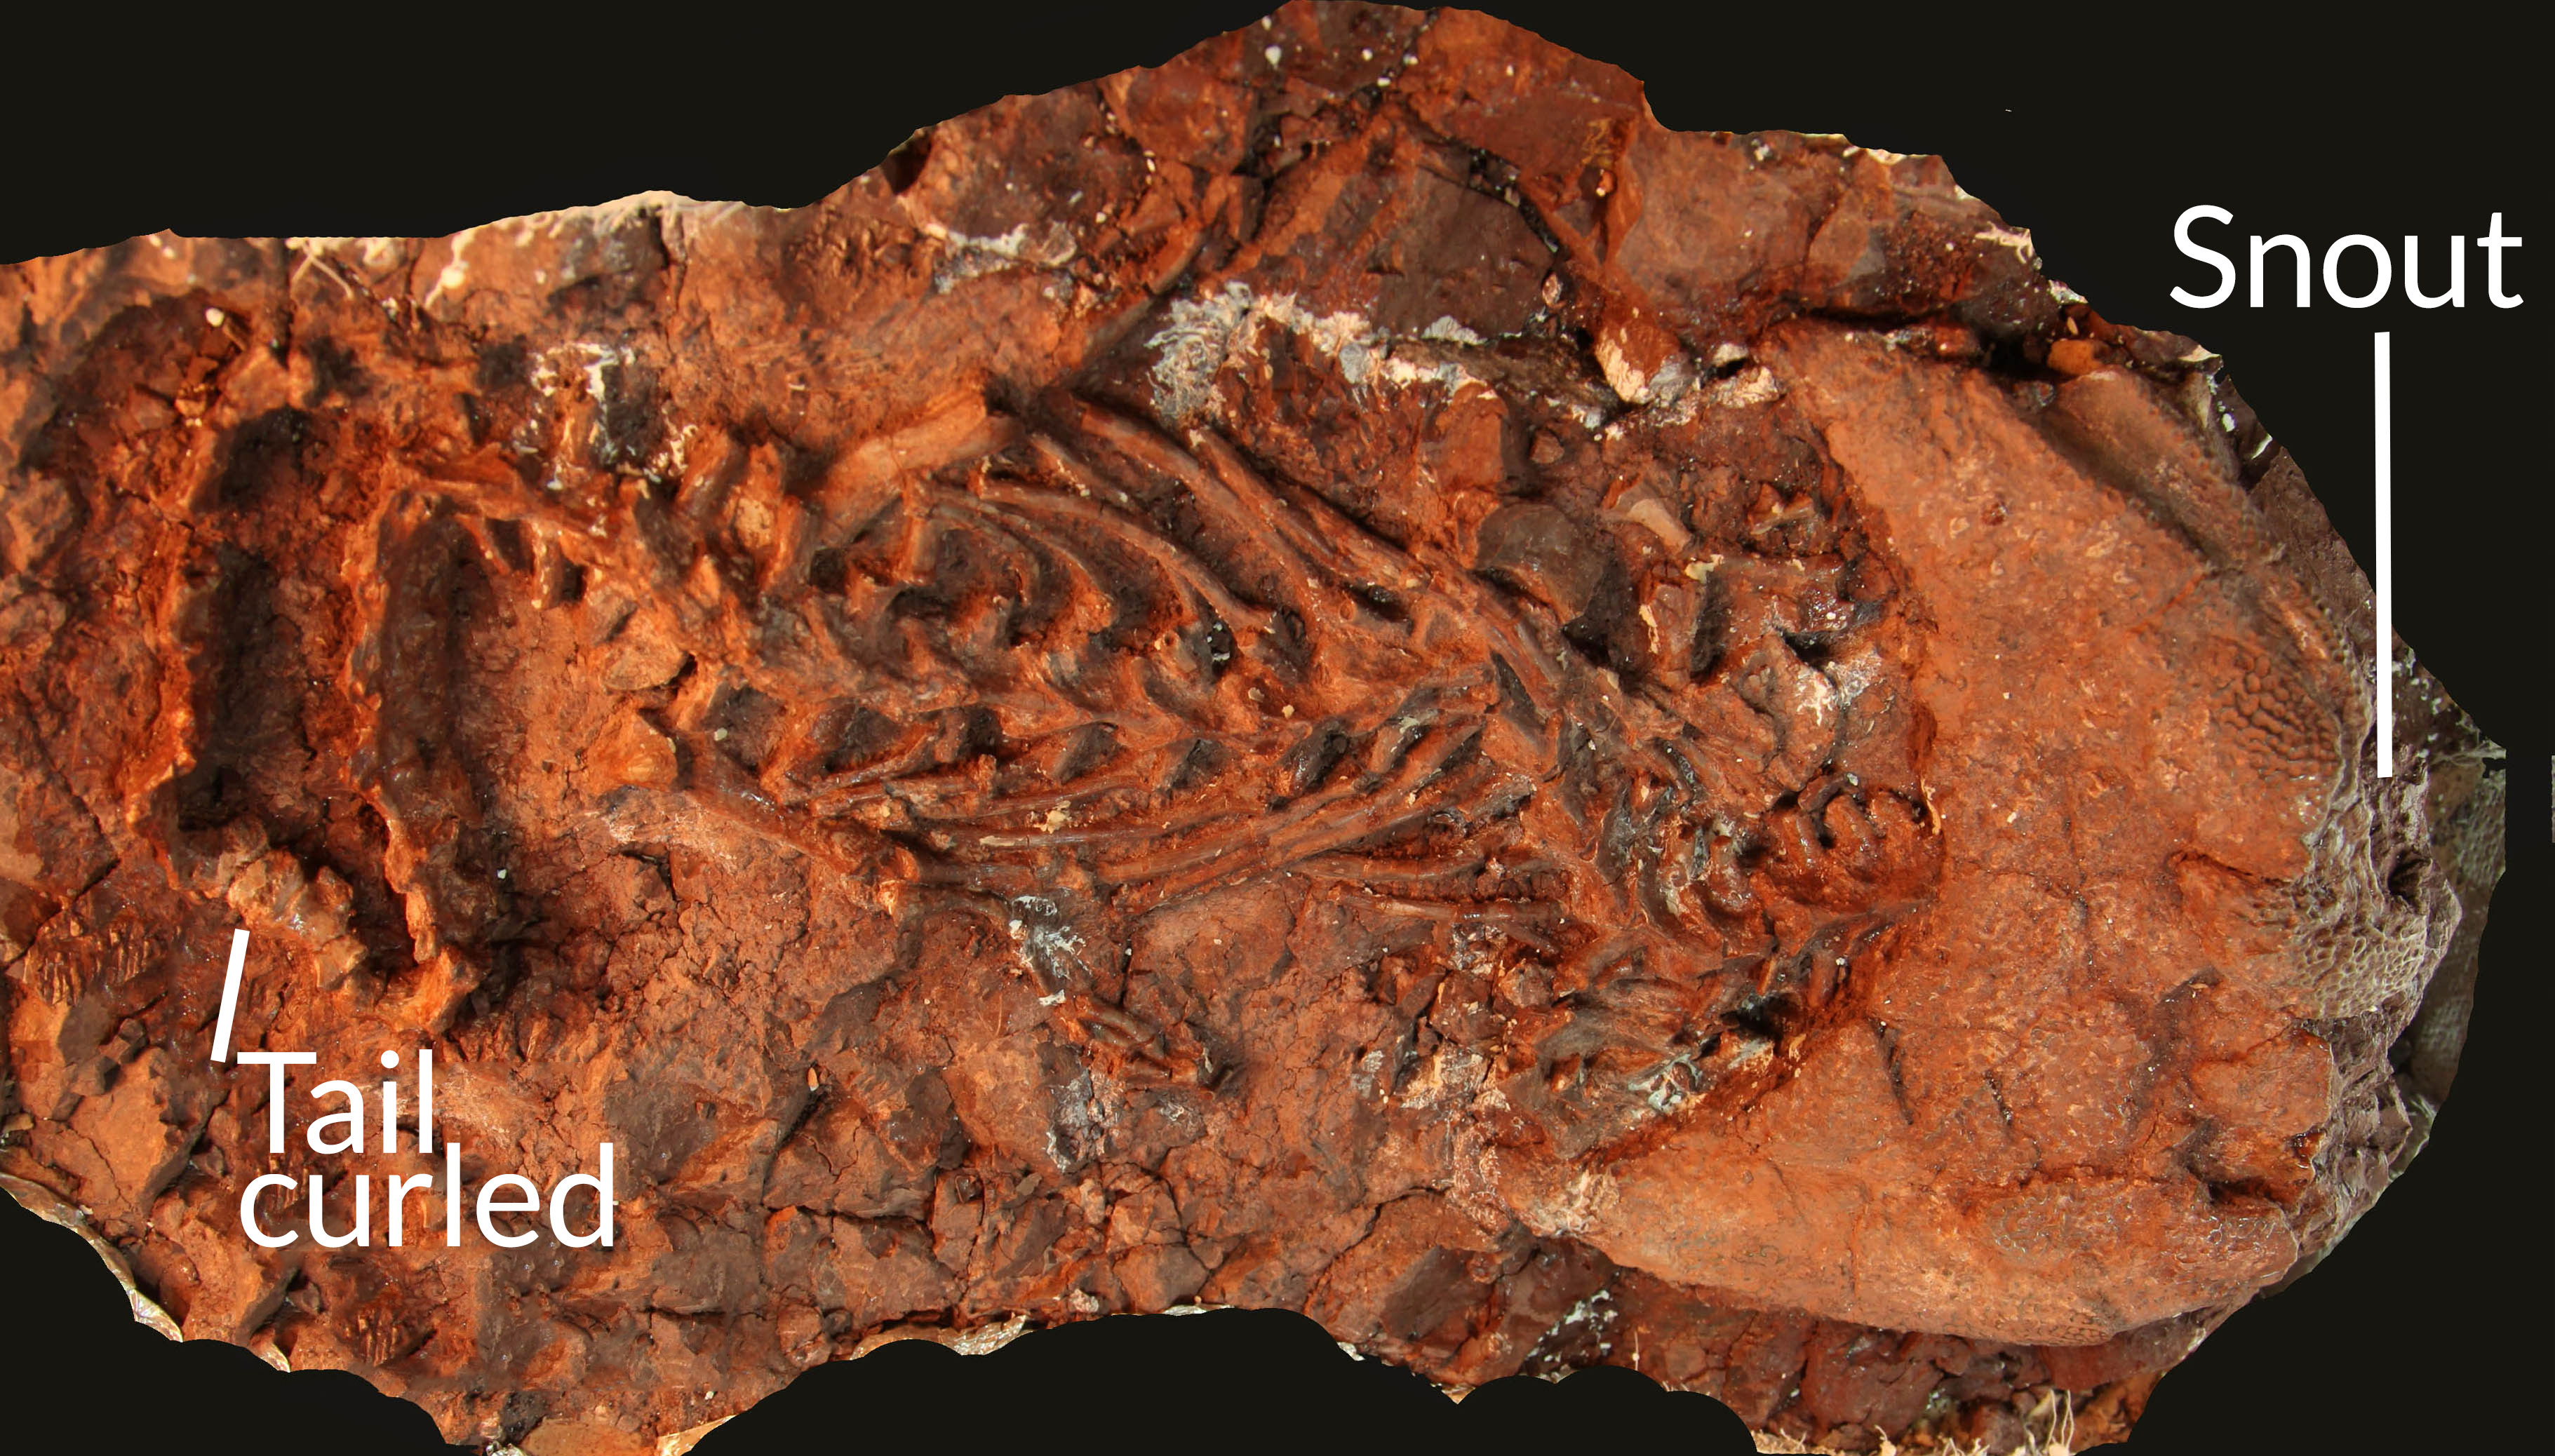 dimetrodon fossil